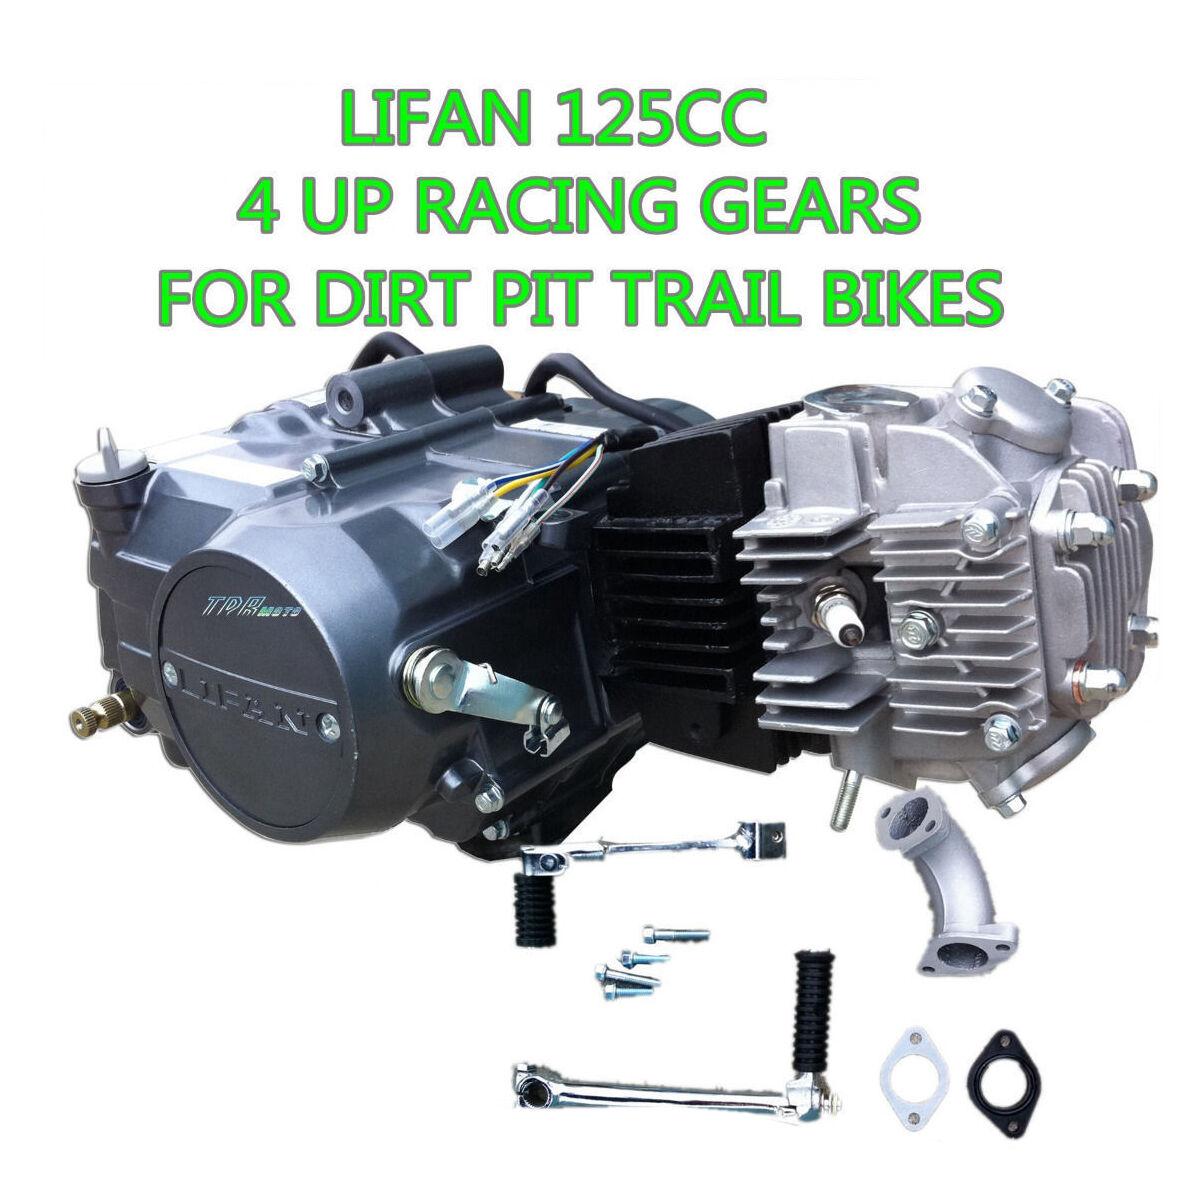 LIFAN 125cc 4UP Gear Manual Clutch Engine Motor Dirt Pit Bike Atomik  Thumpstar